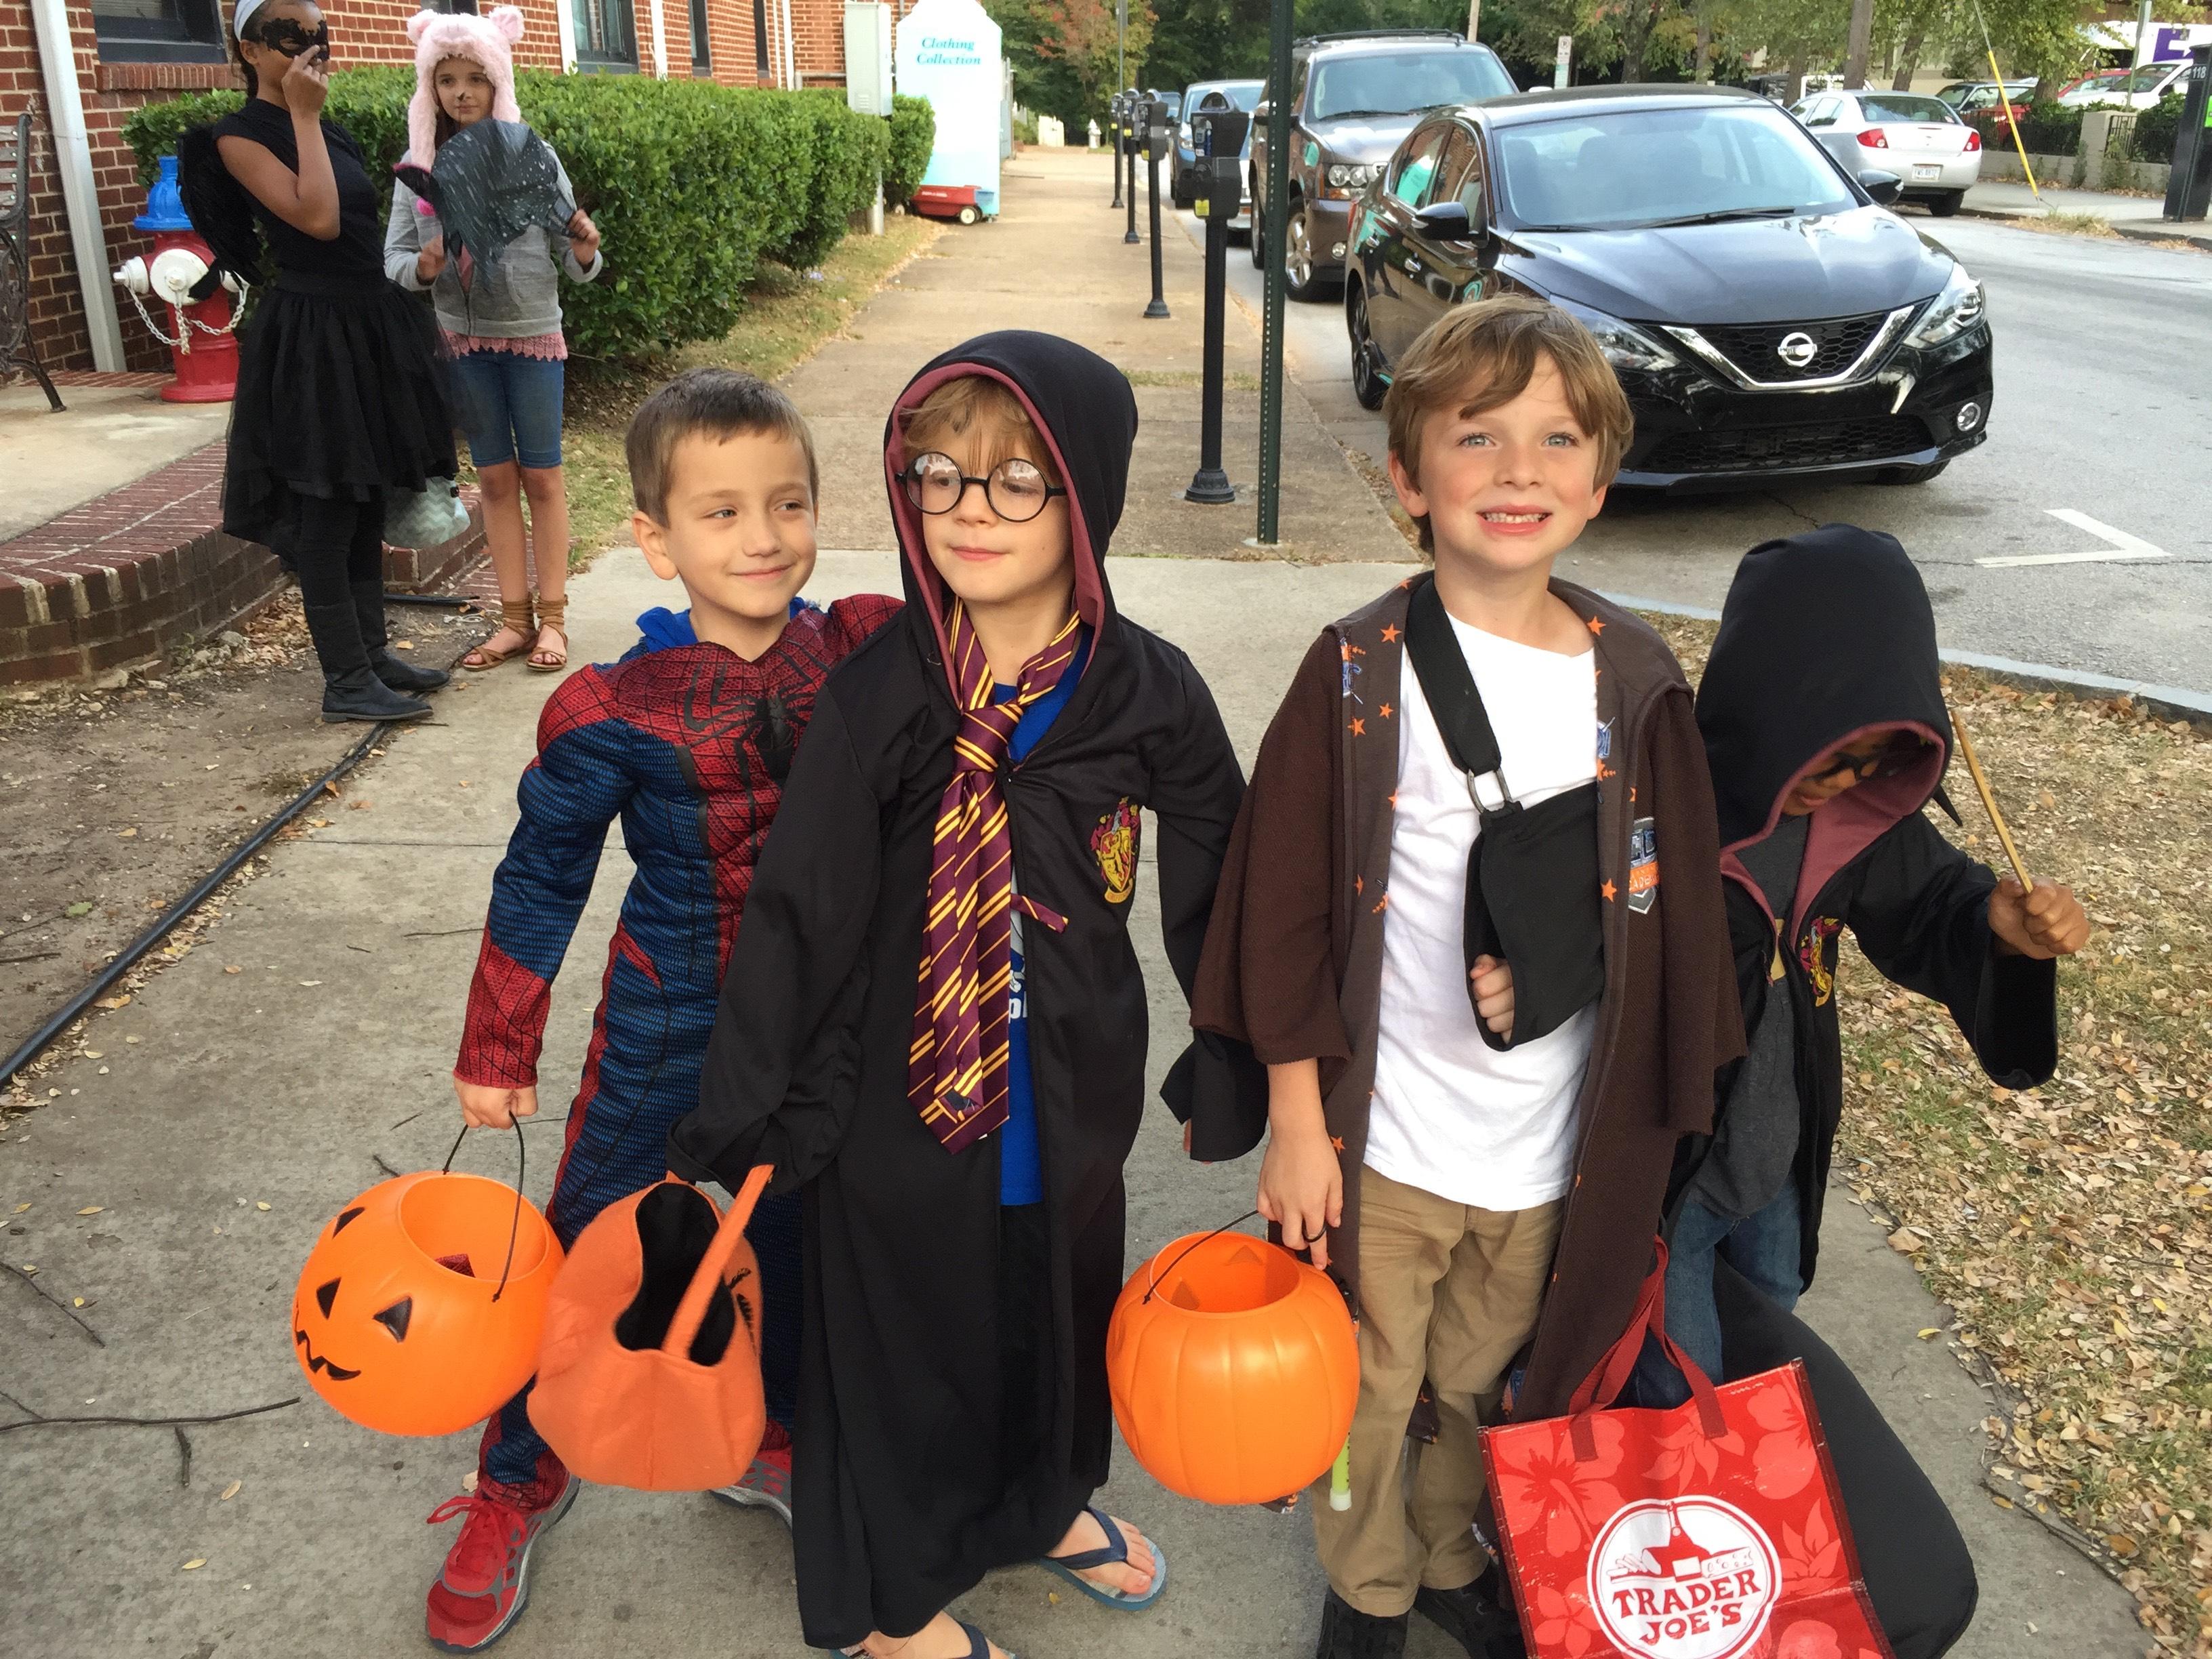 halloween | Virginia-Highland Civic Association